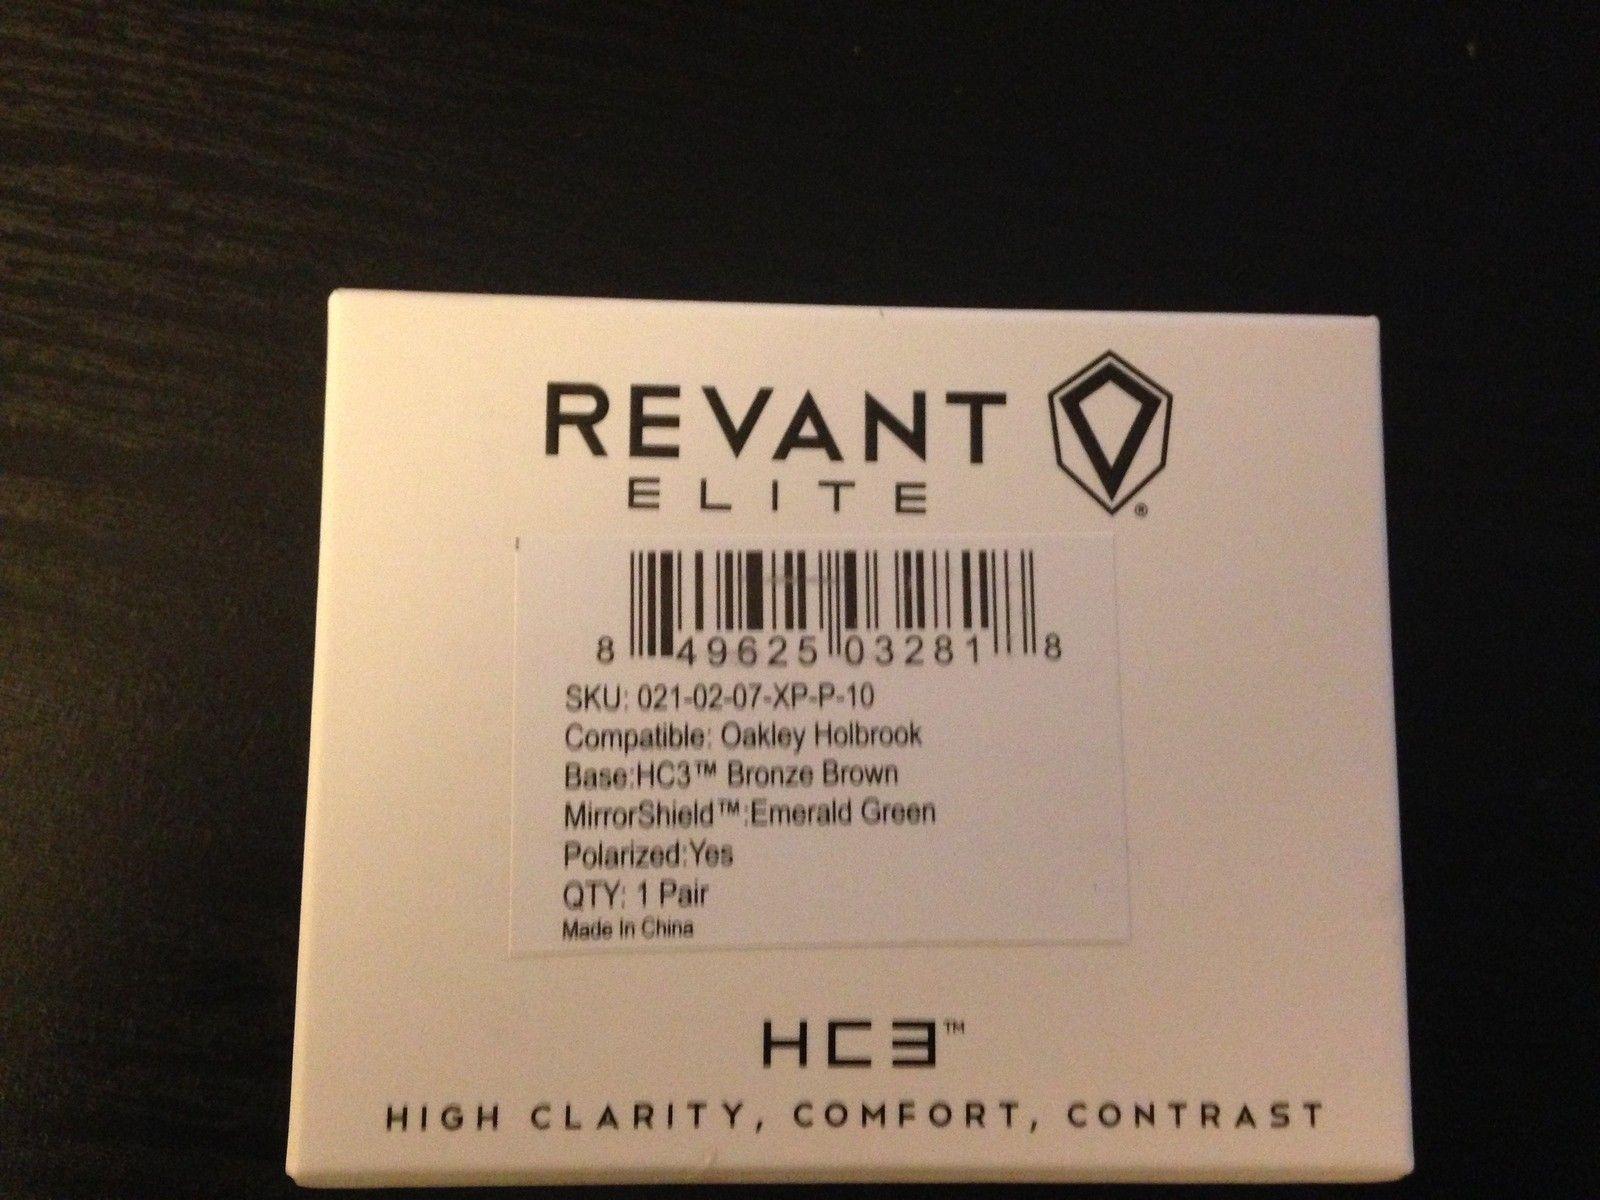 Revant Optics HC3 Elite Mirrorshield Lens Review - IMG_1731.jpg